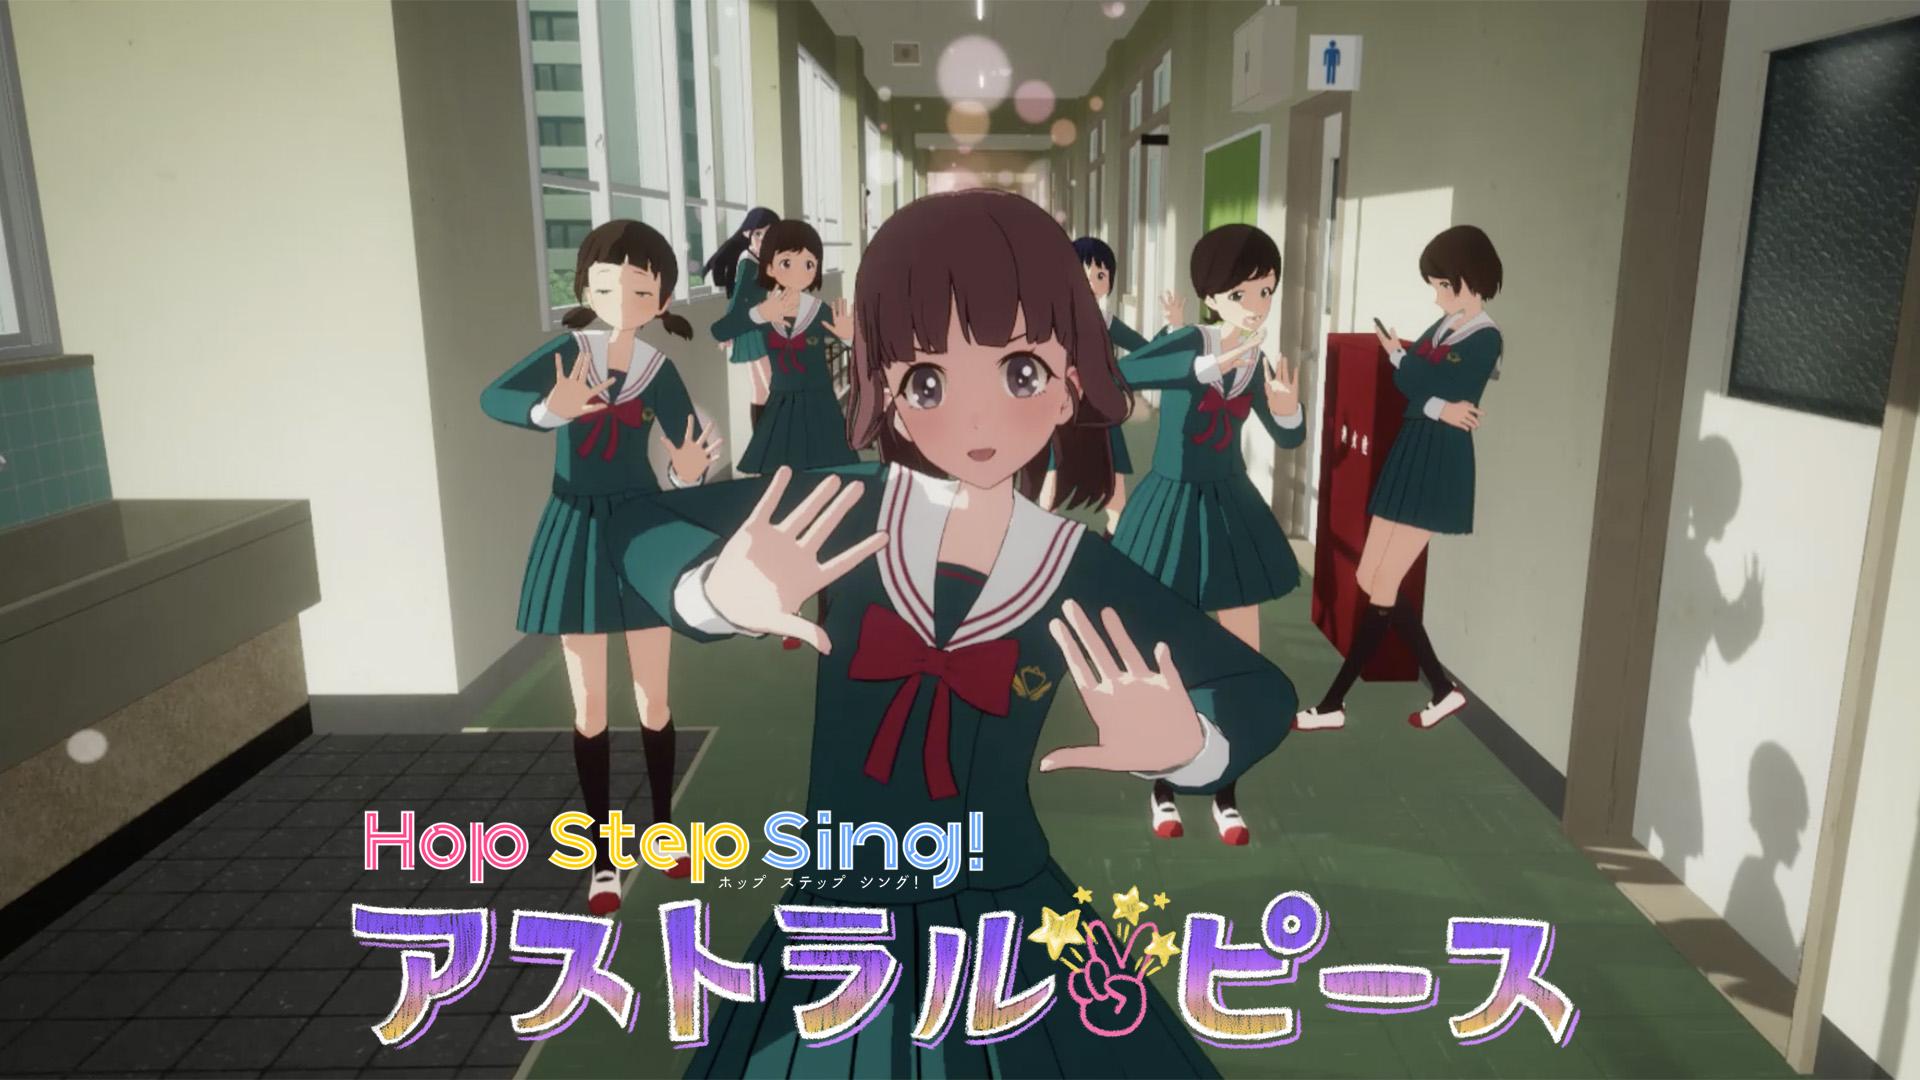 Hop Step Sing! アストラル・ピース